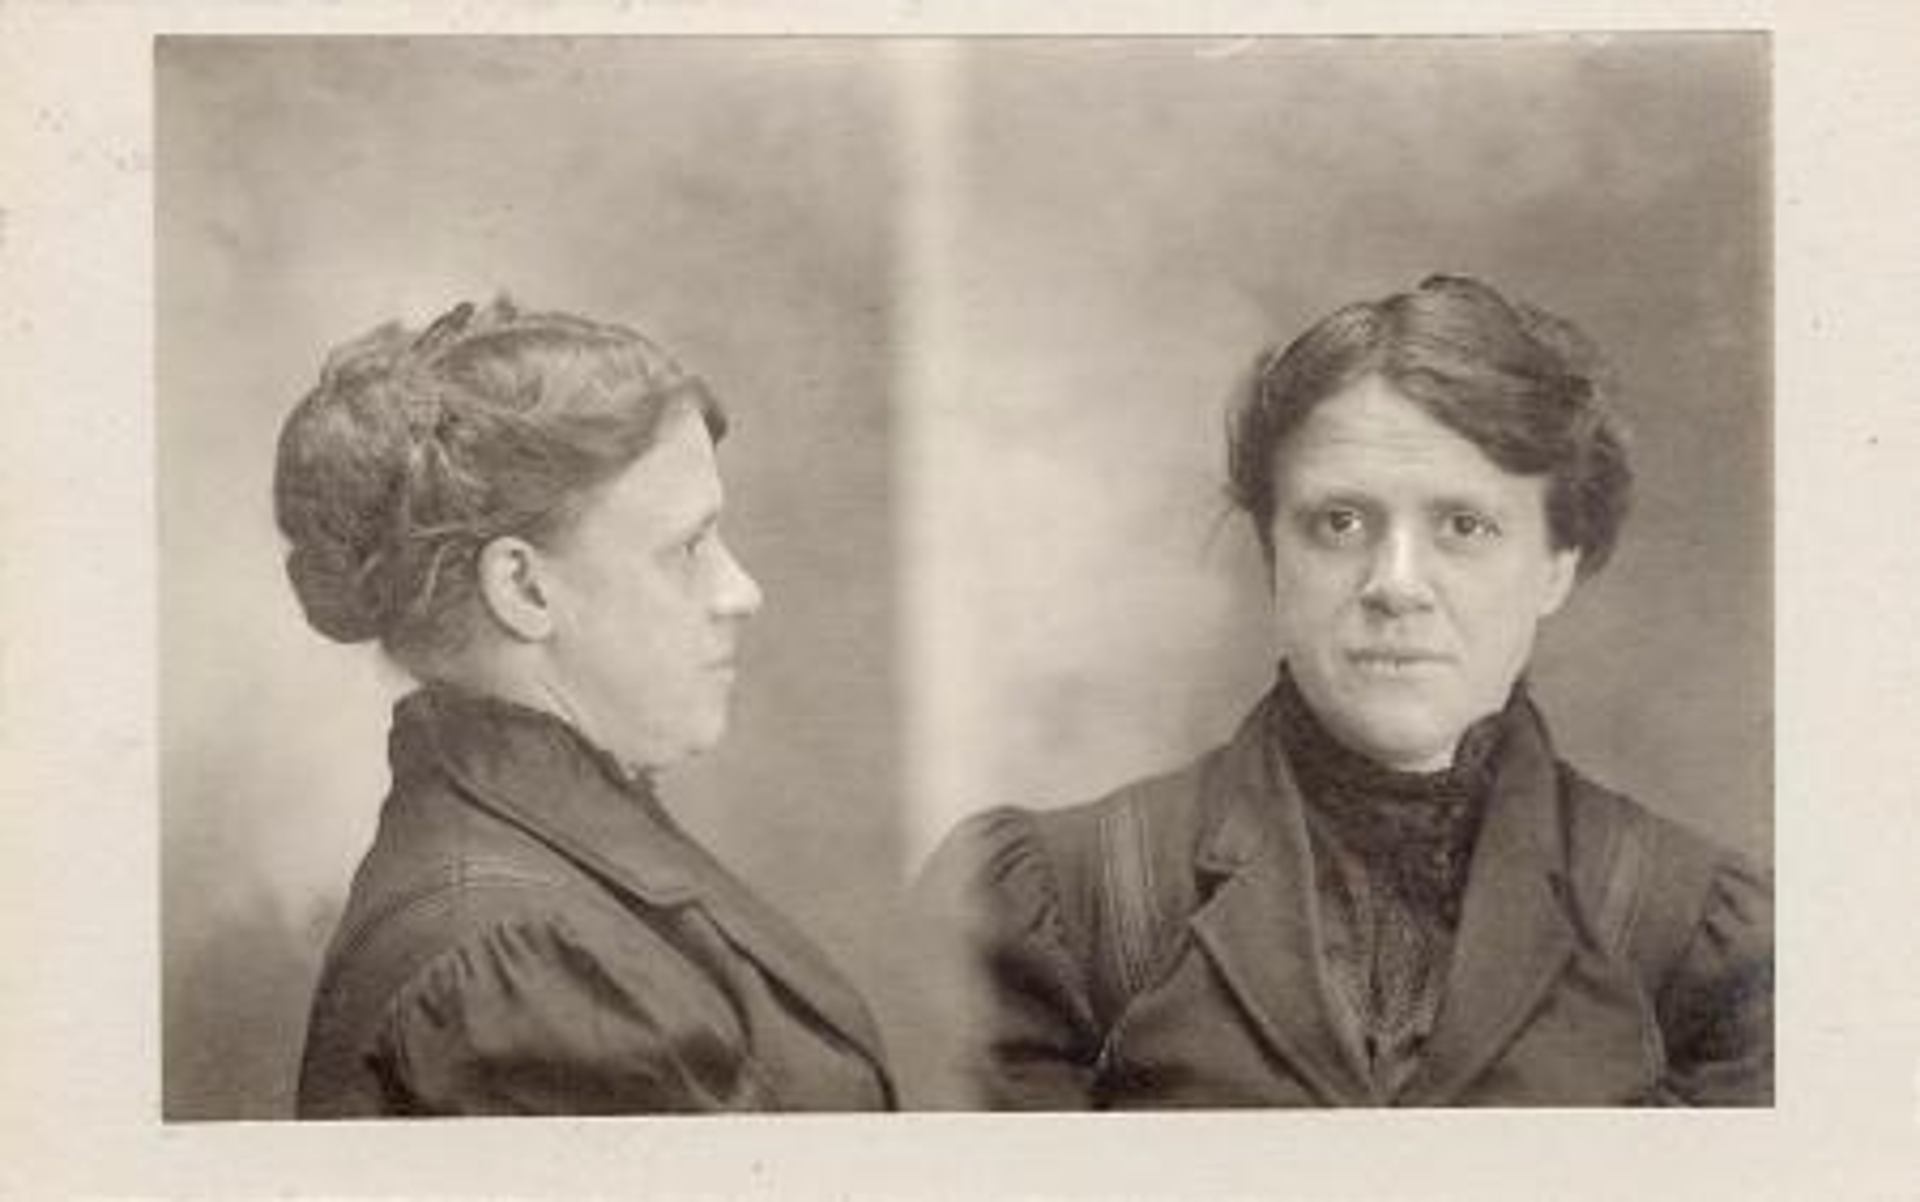 Bertillon card and mugshot